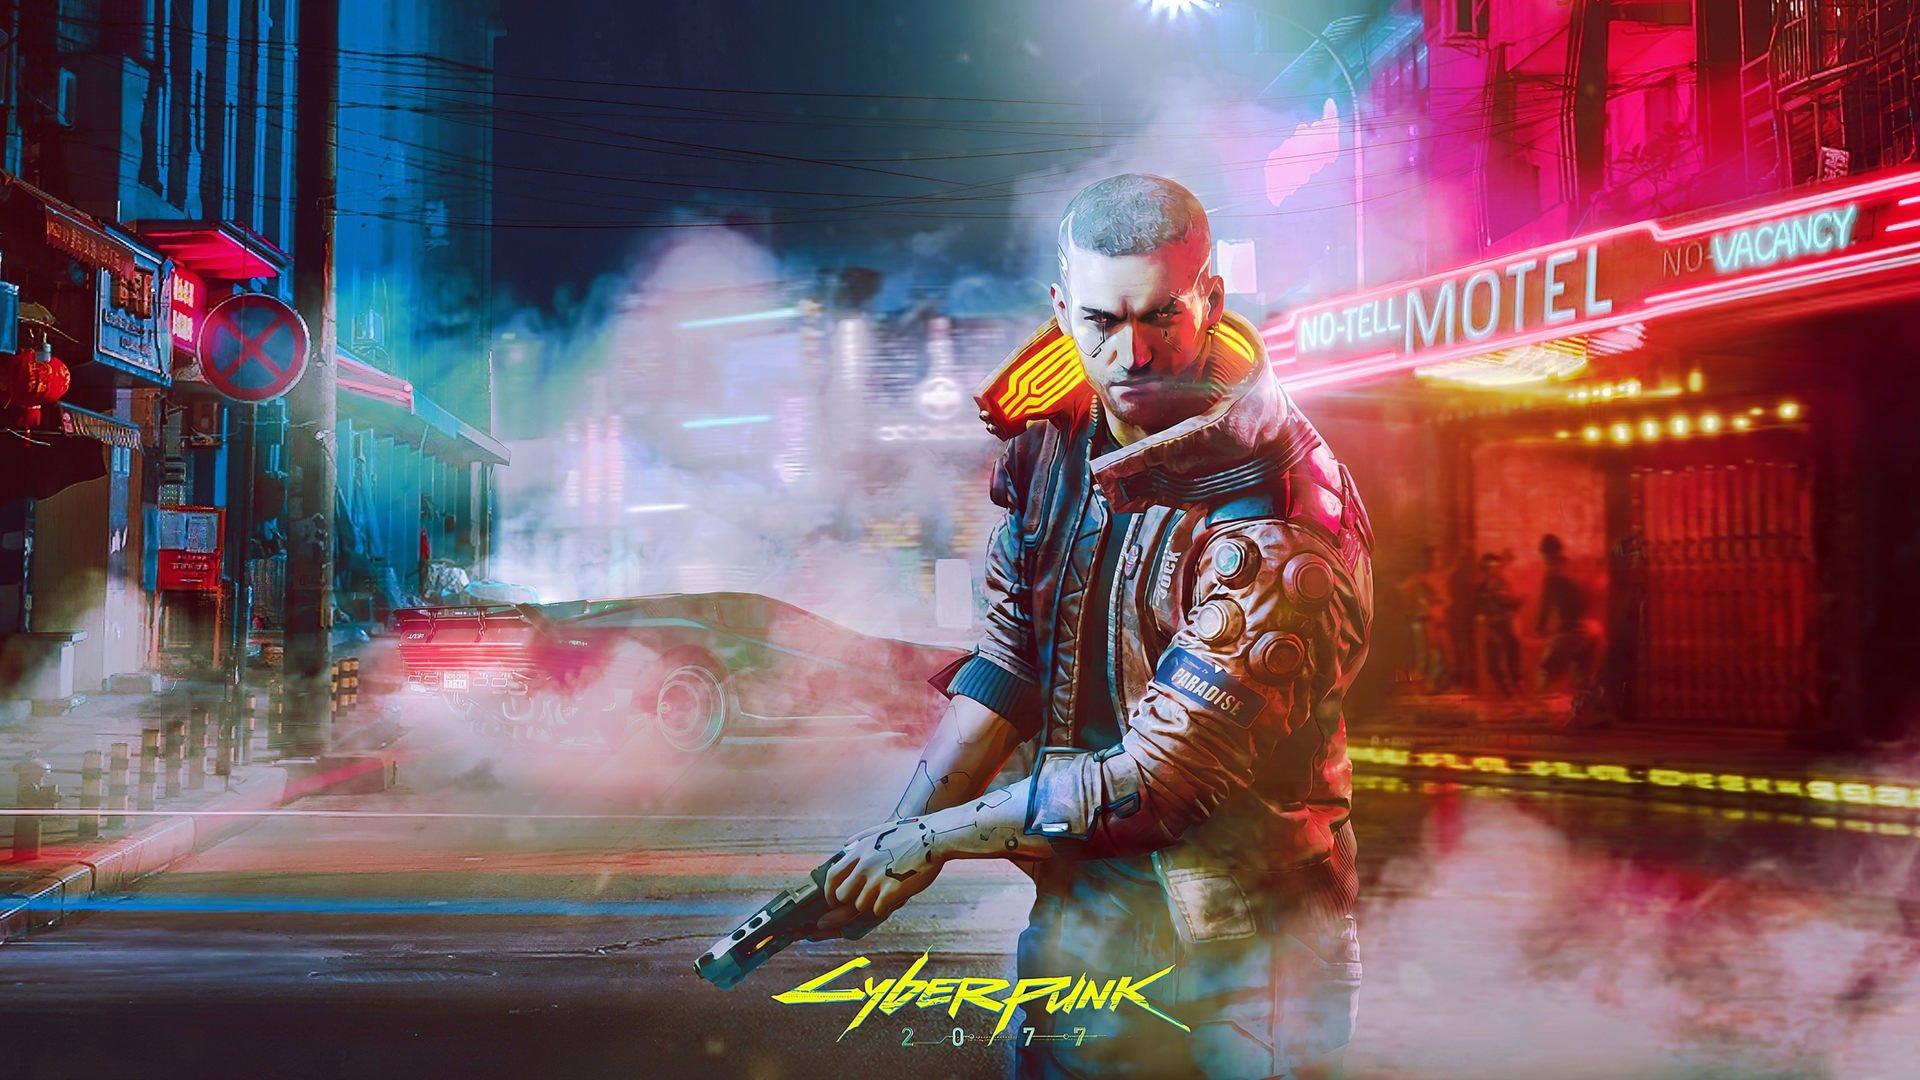 Cyberpunk 2077 یک هفته قبل از انتشارش آپدیتی ۴۳ گیگابایتی دریافت کرد